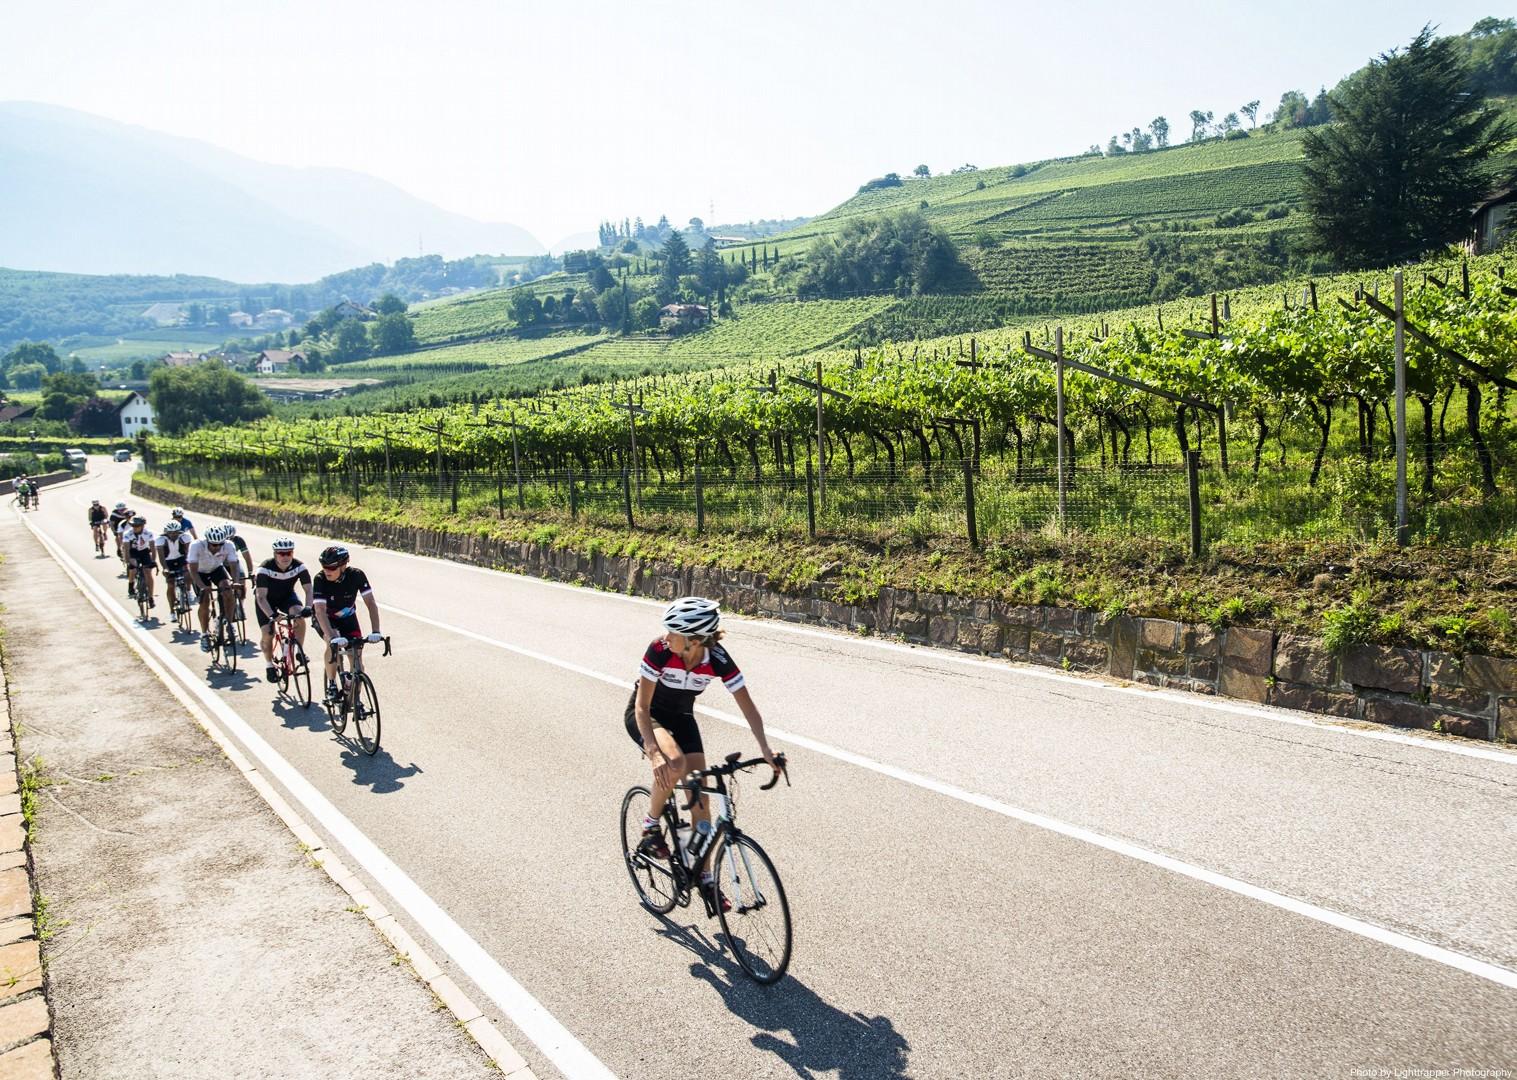 road-cycling-holiday-in-italian-alps.jpg - Italy - Italian Alps - Guided Road Cycling Holiday - Italia Road Cycling